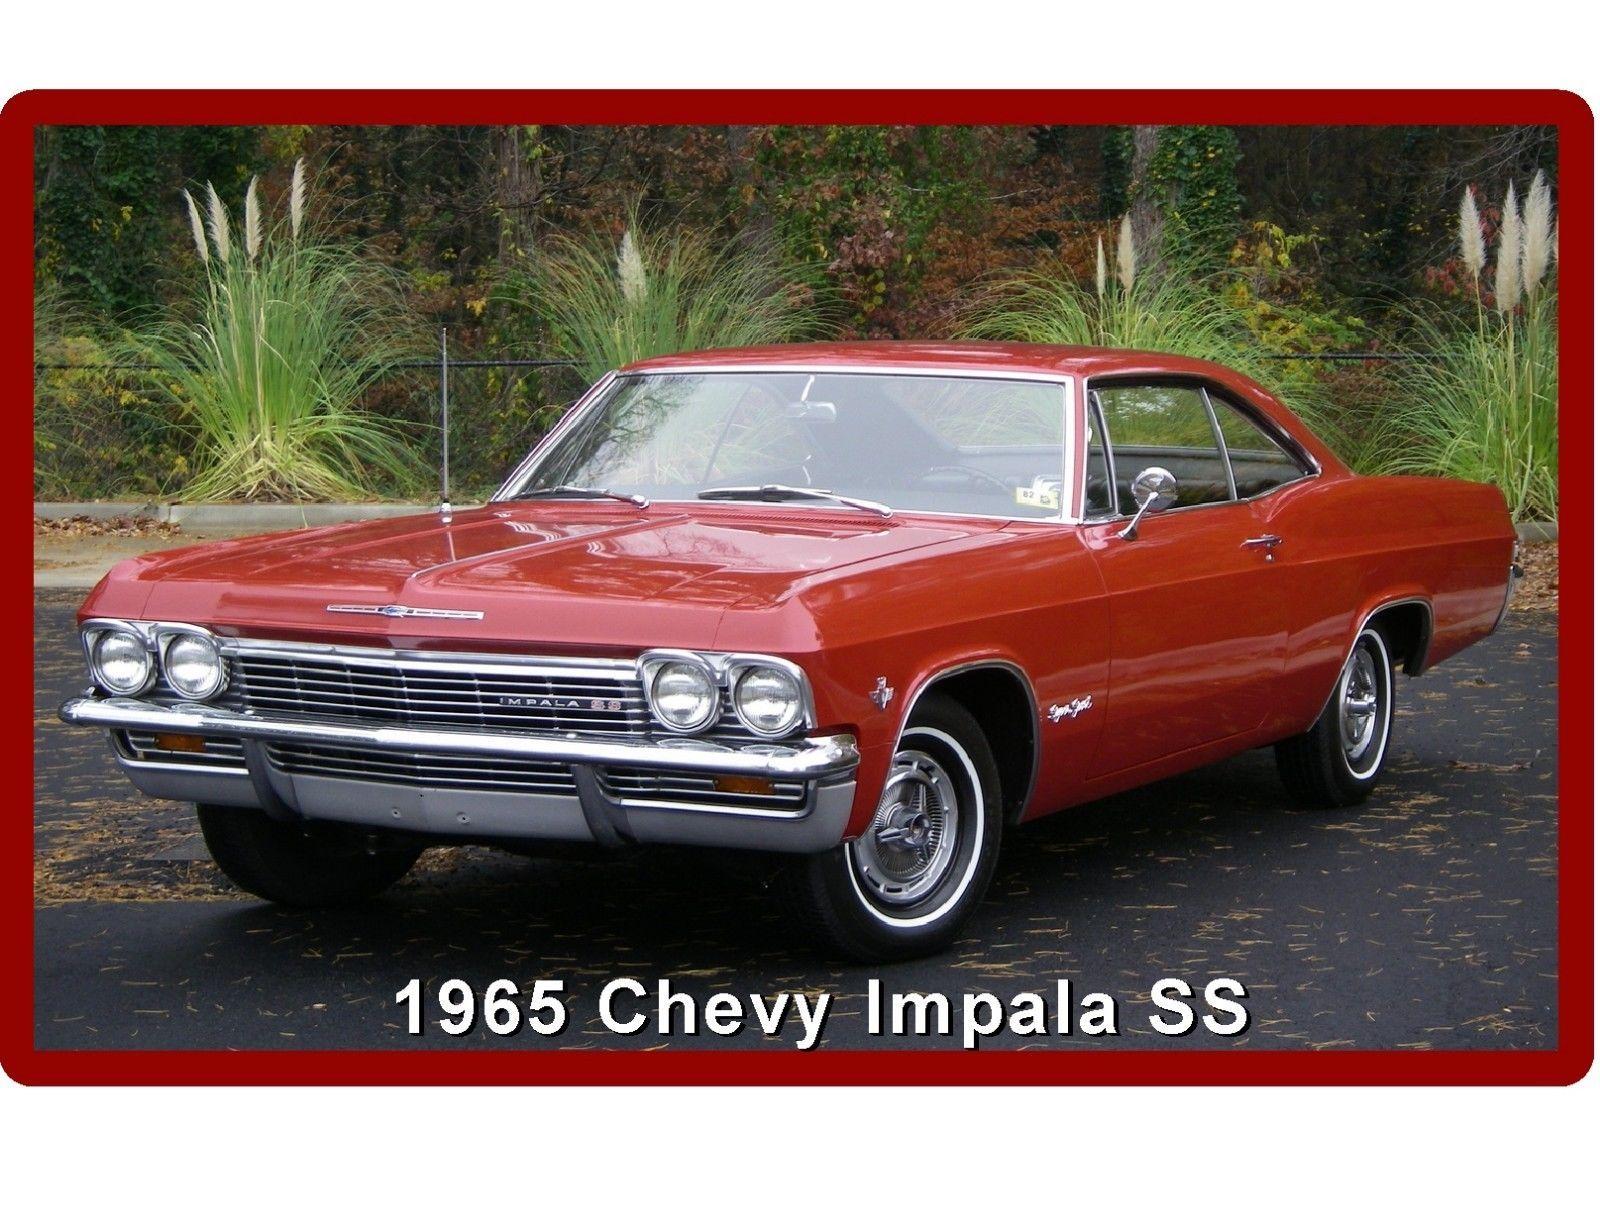 $5 5 1965 Chevrolet Impala Ss Coupe Refrigerator Tool Box Magnet